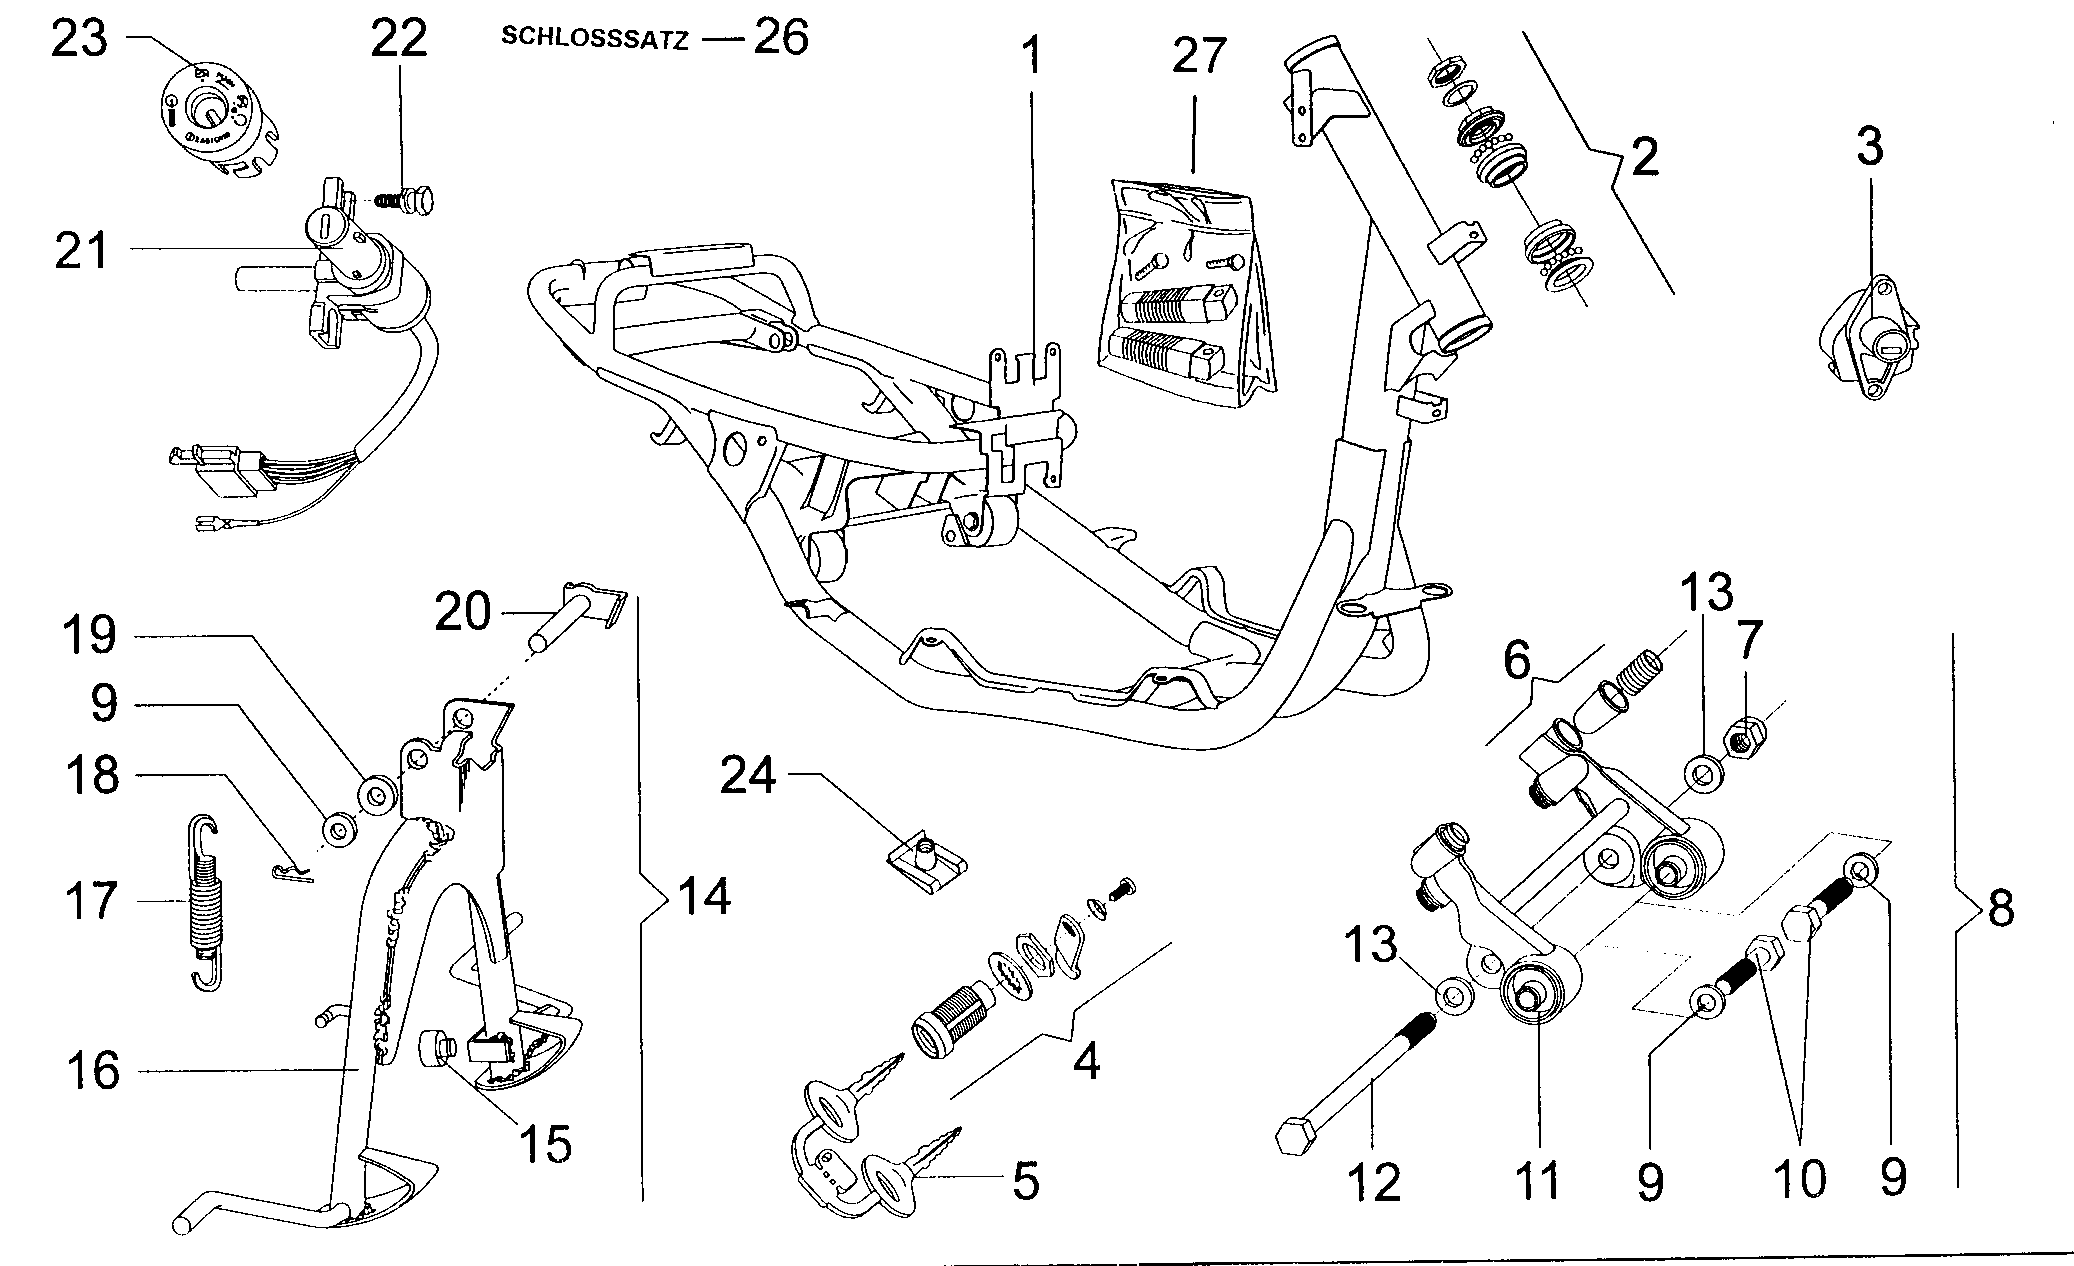 Rahmen / Schloßsatz